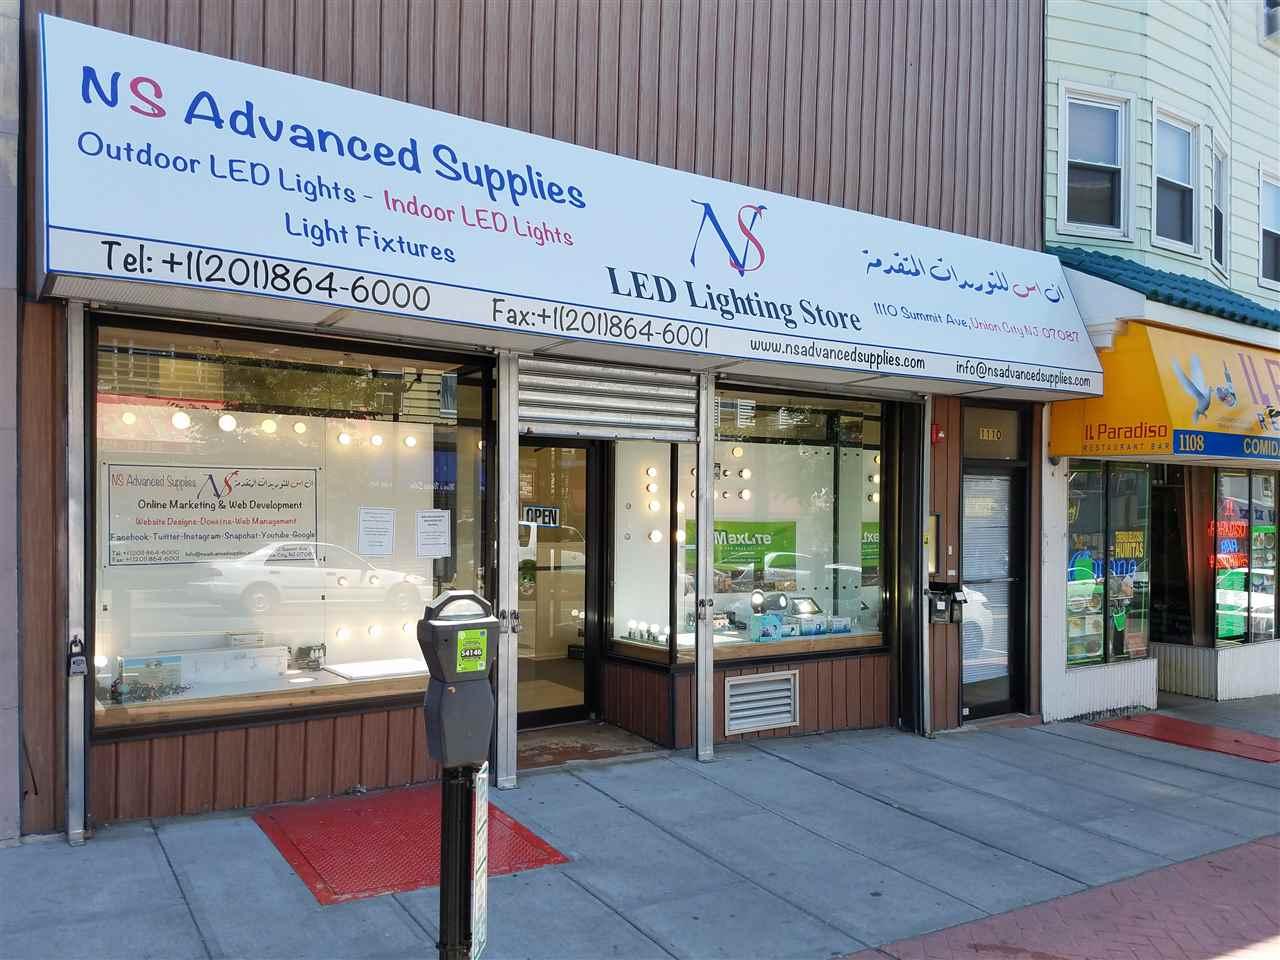 1110 SUMMIT AVE Retail, Union City, NJ 07087